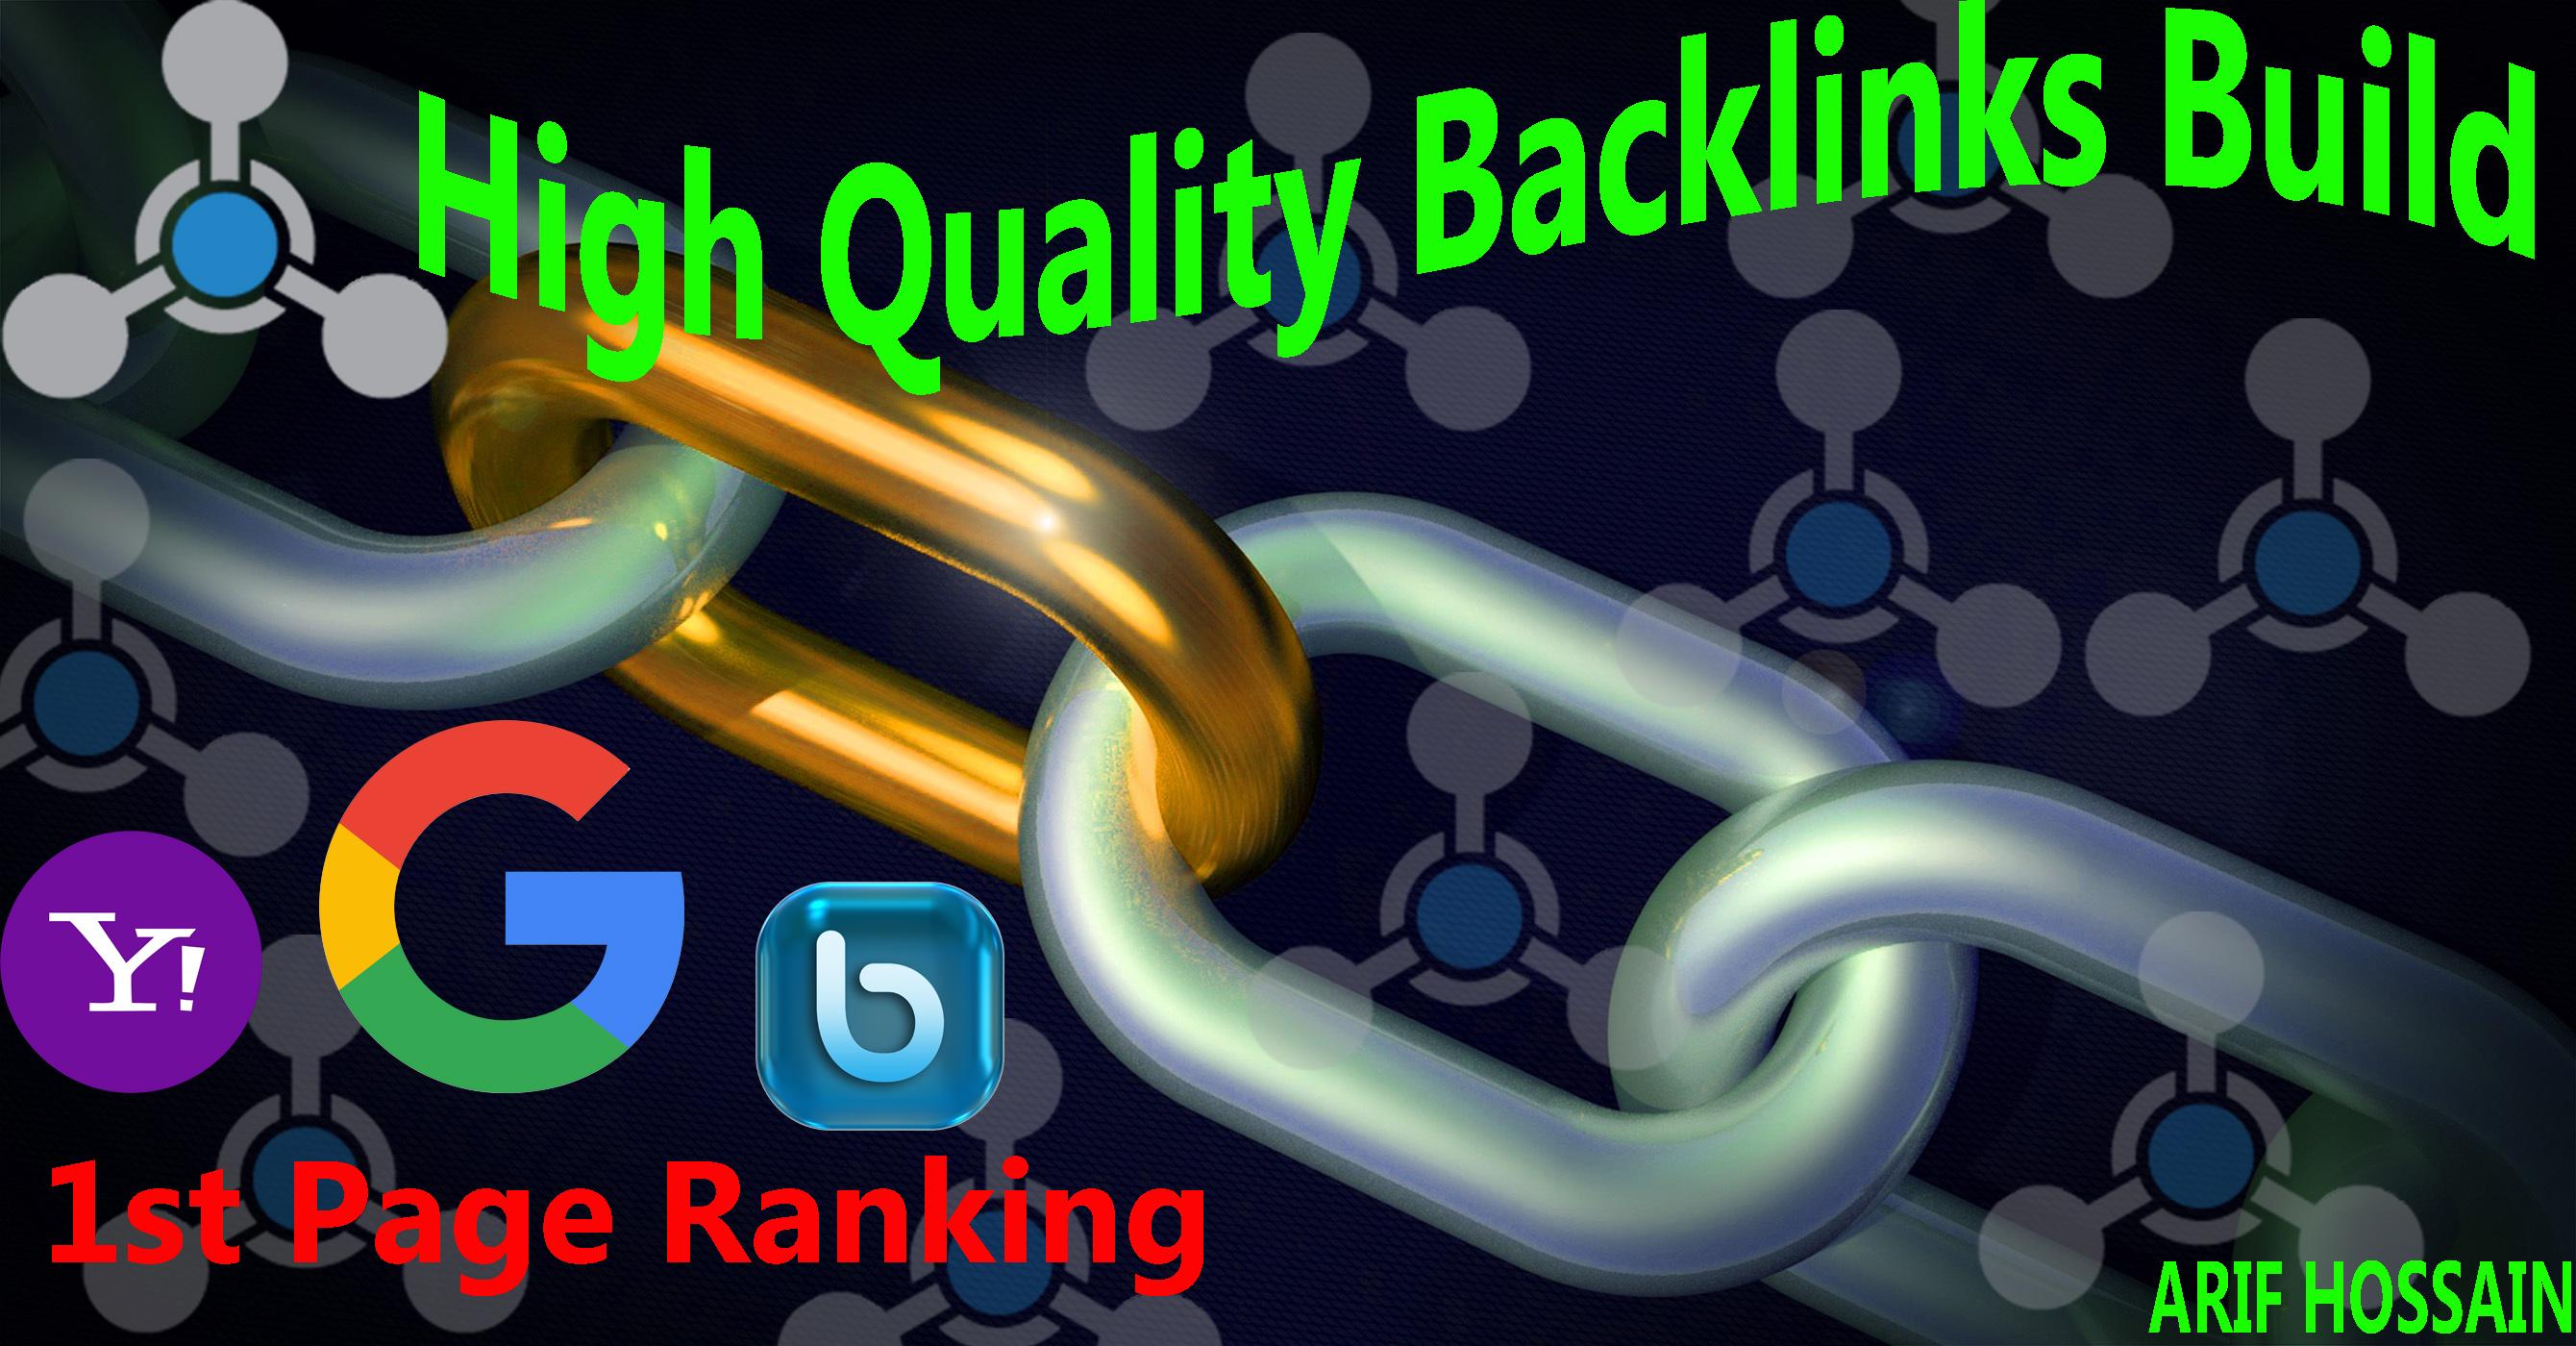 DA PA 80+ and PR 7+ web 2.0 site HQ 30+ Backlinks create